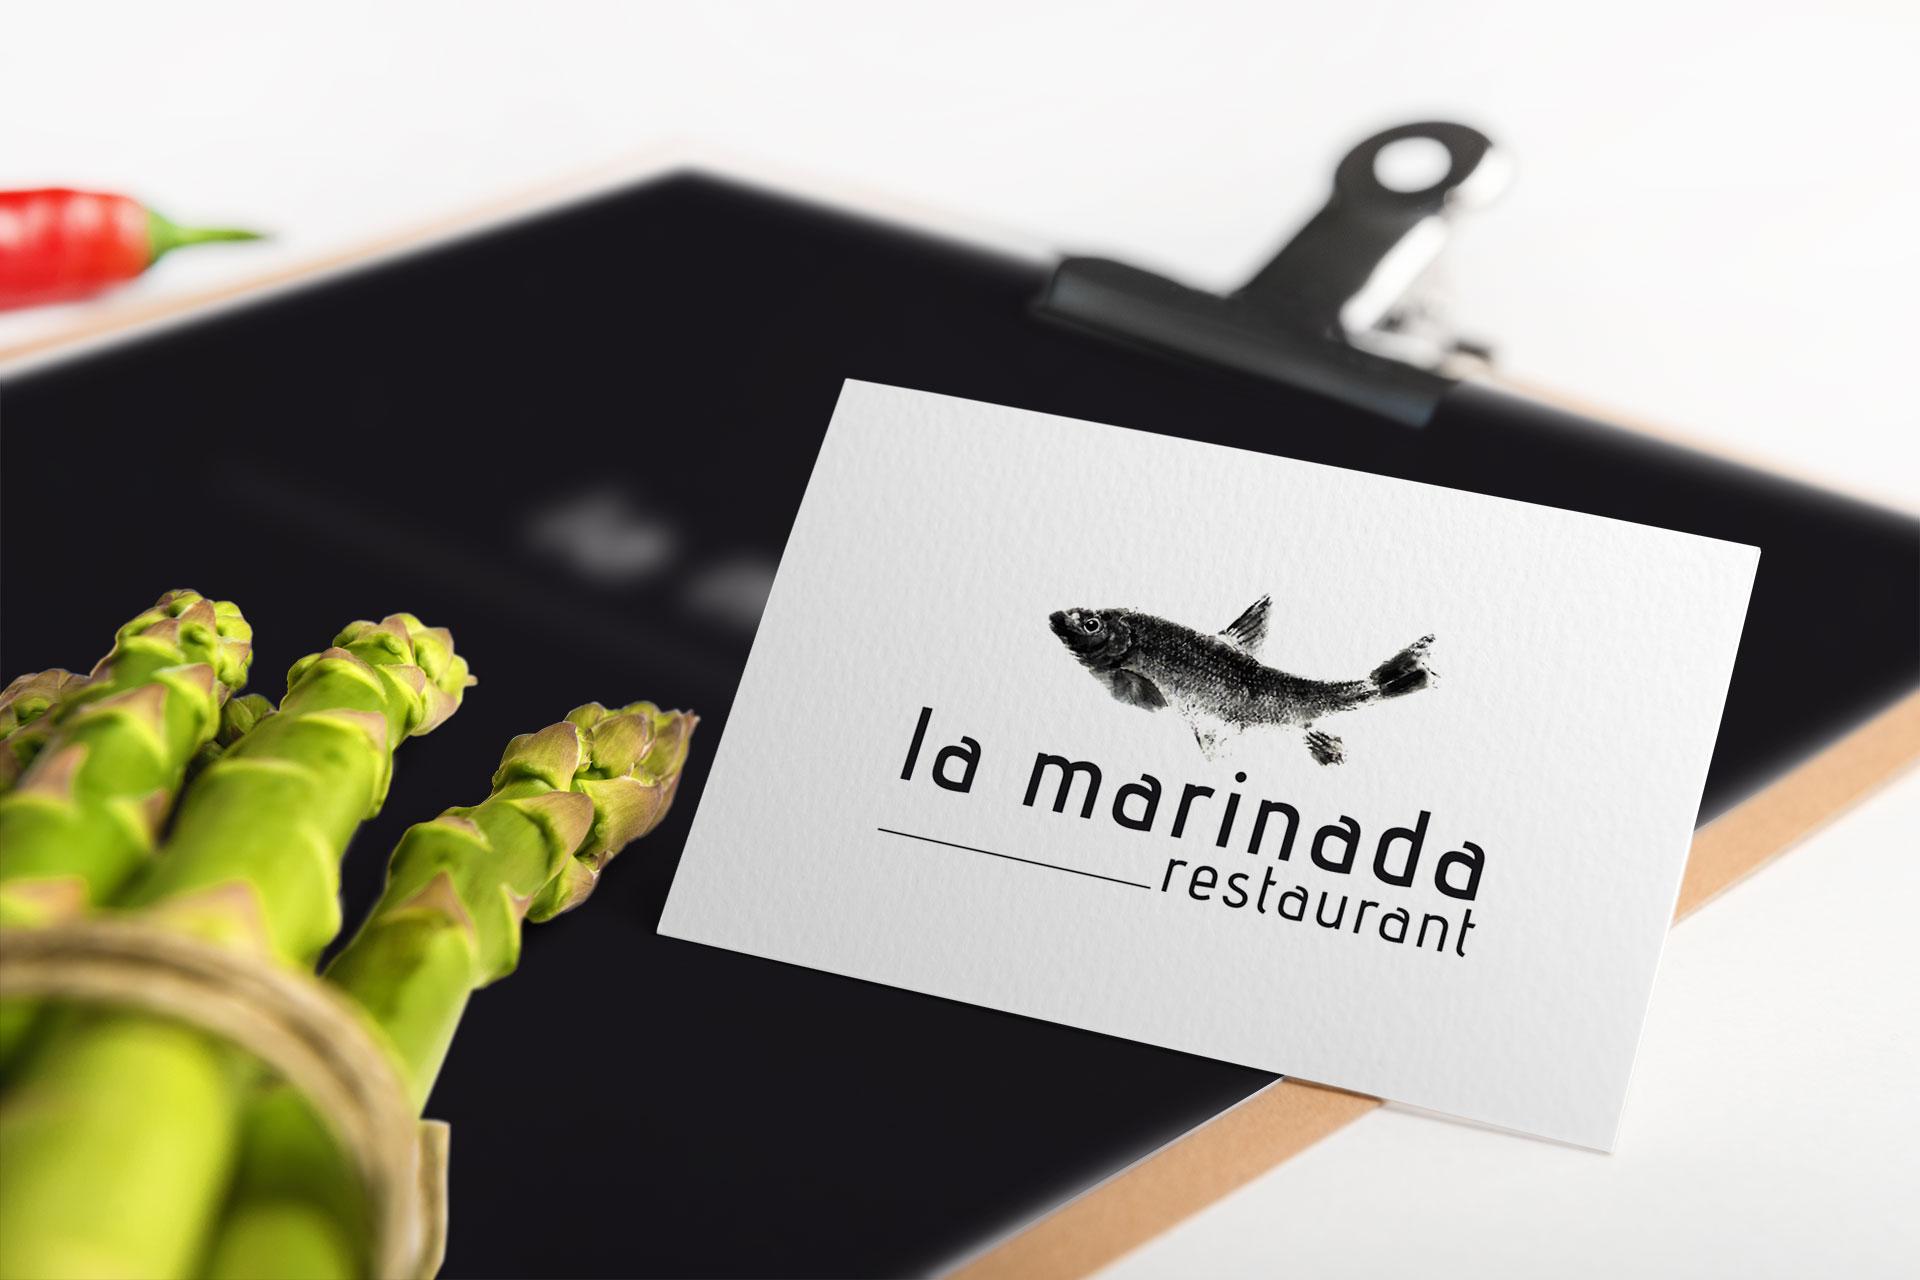 Restaurant la Marinada